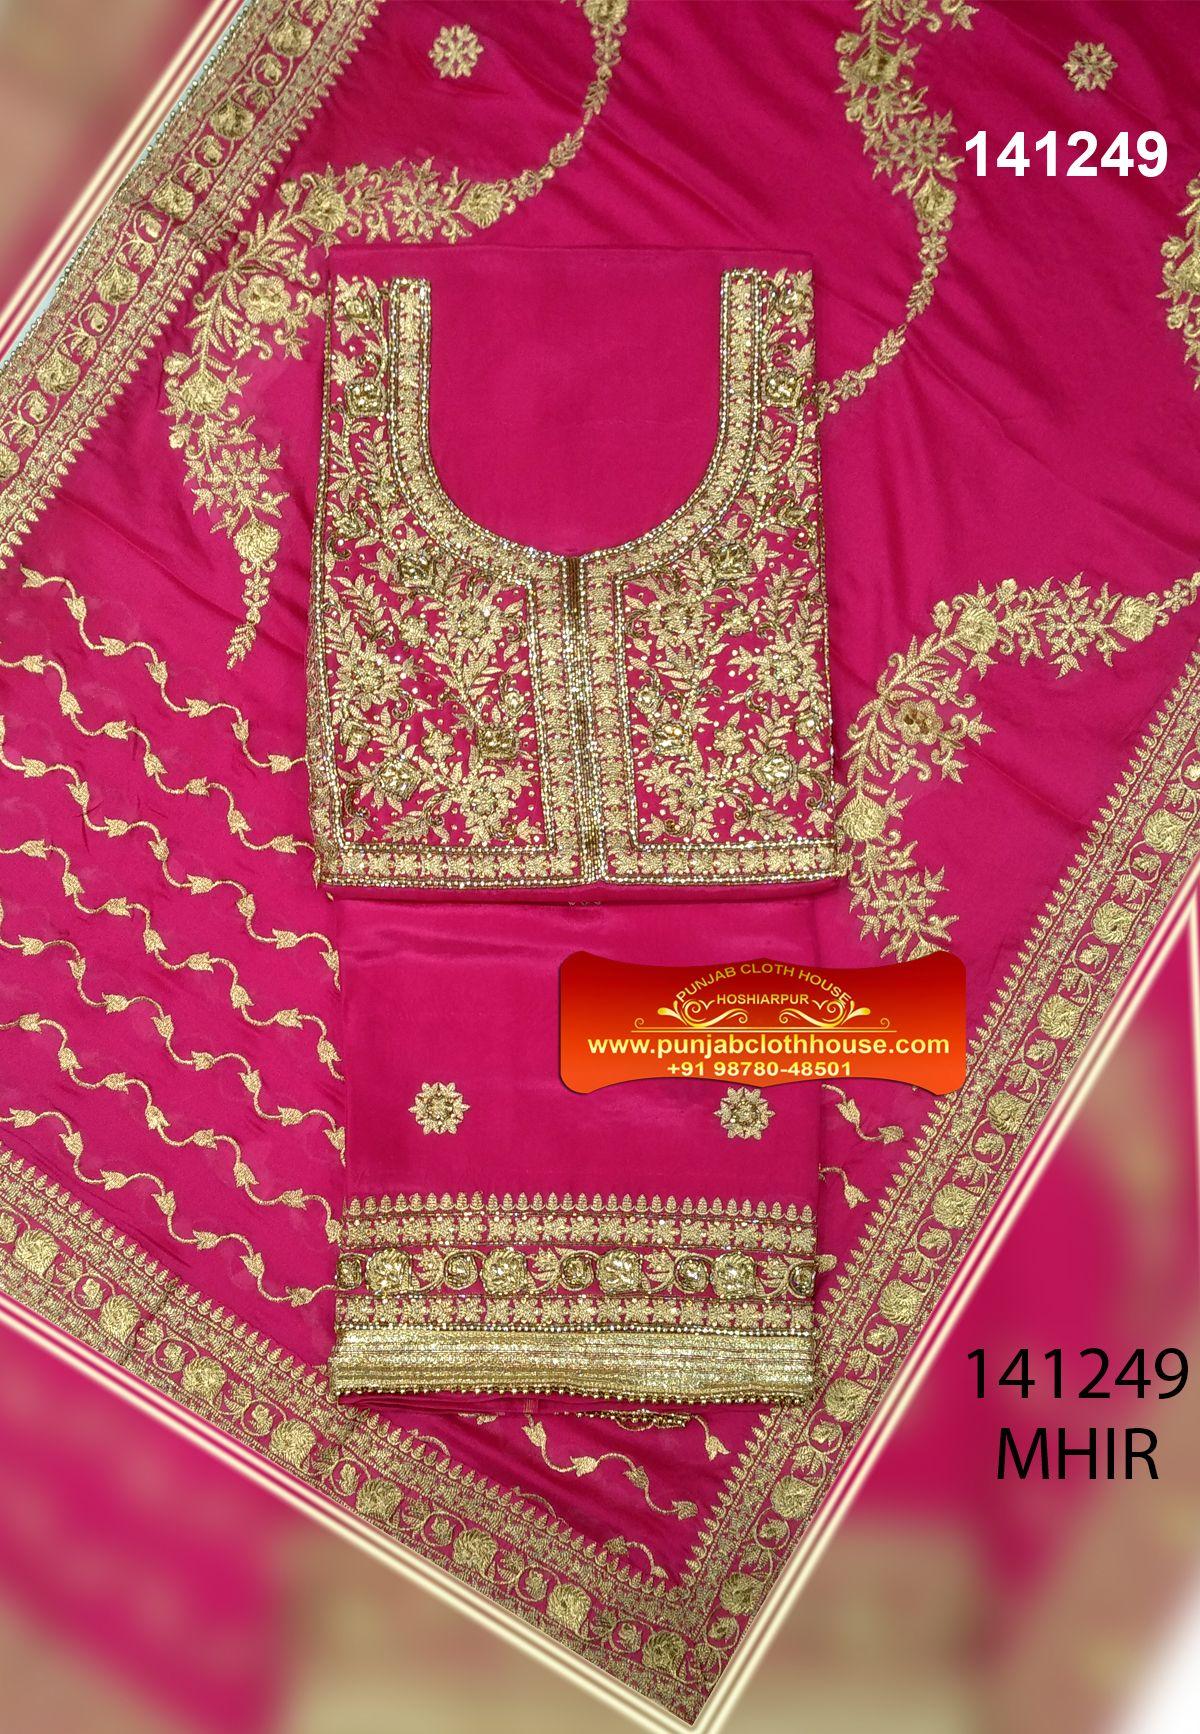 Pin by Punjab Cloth House Hoshiarpur on PUNJABI SUITS